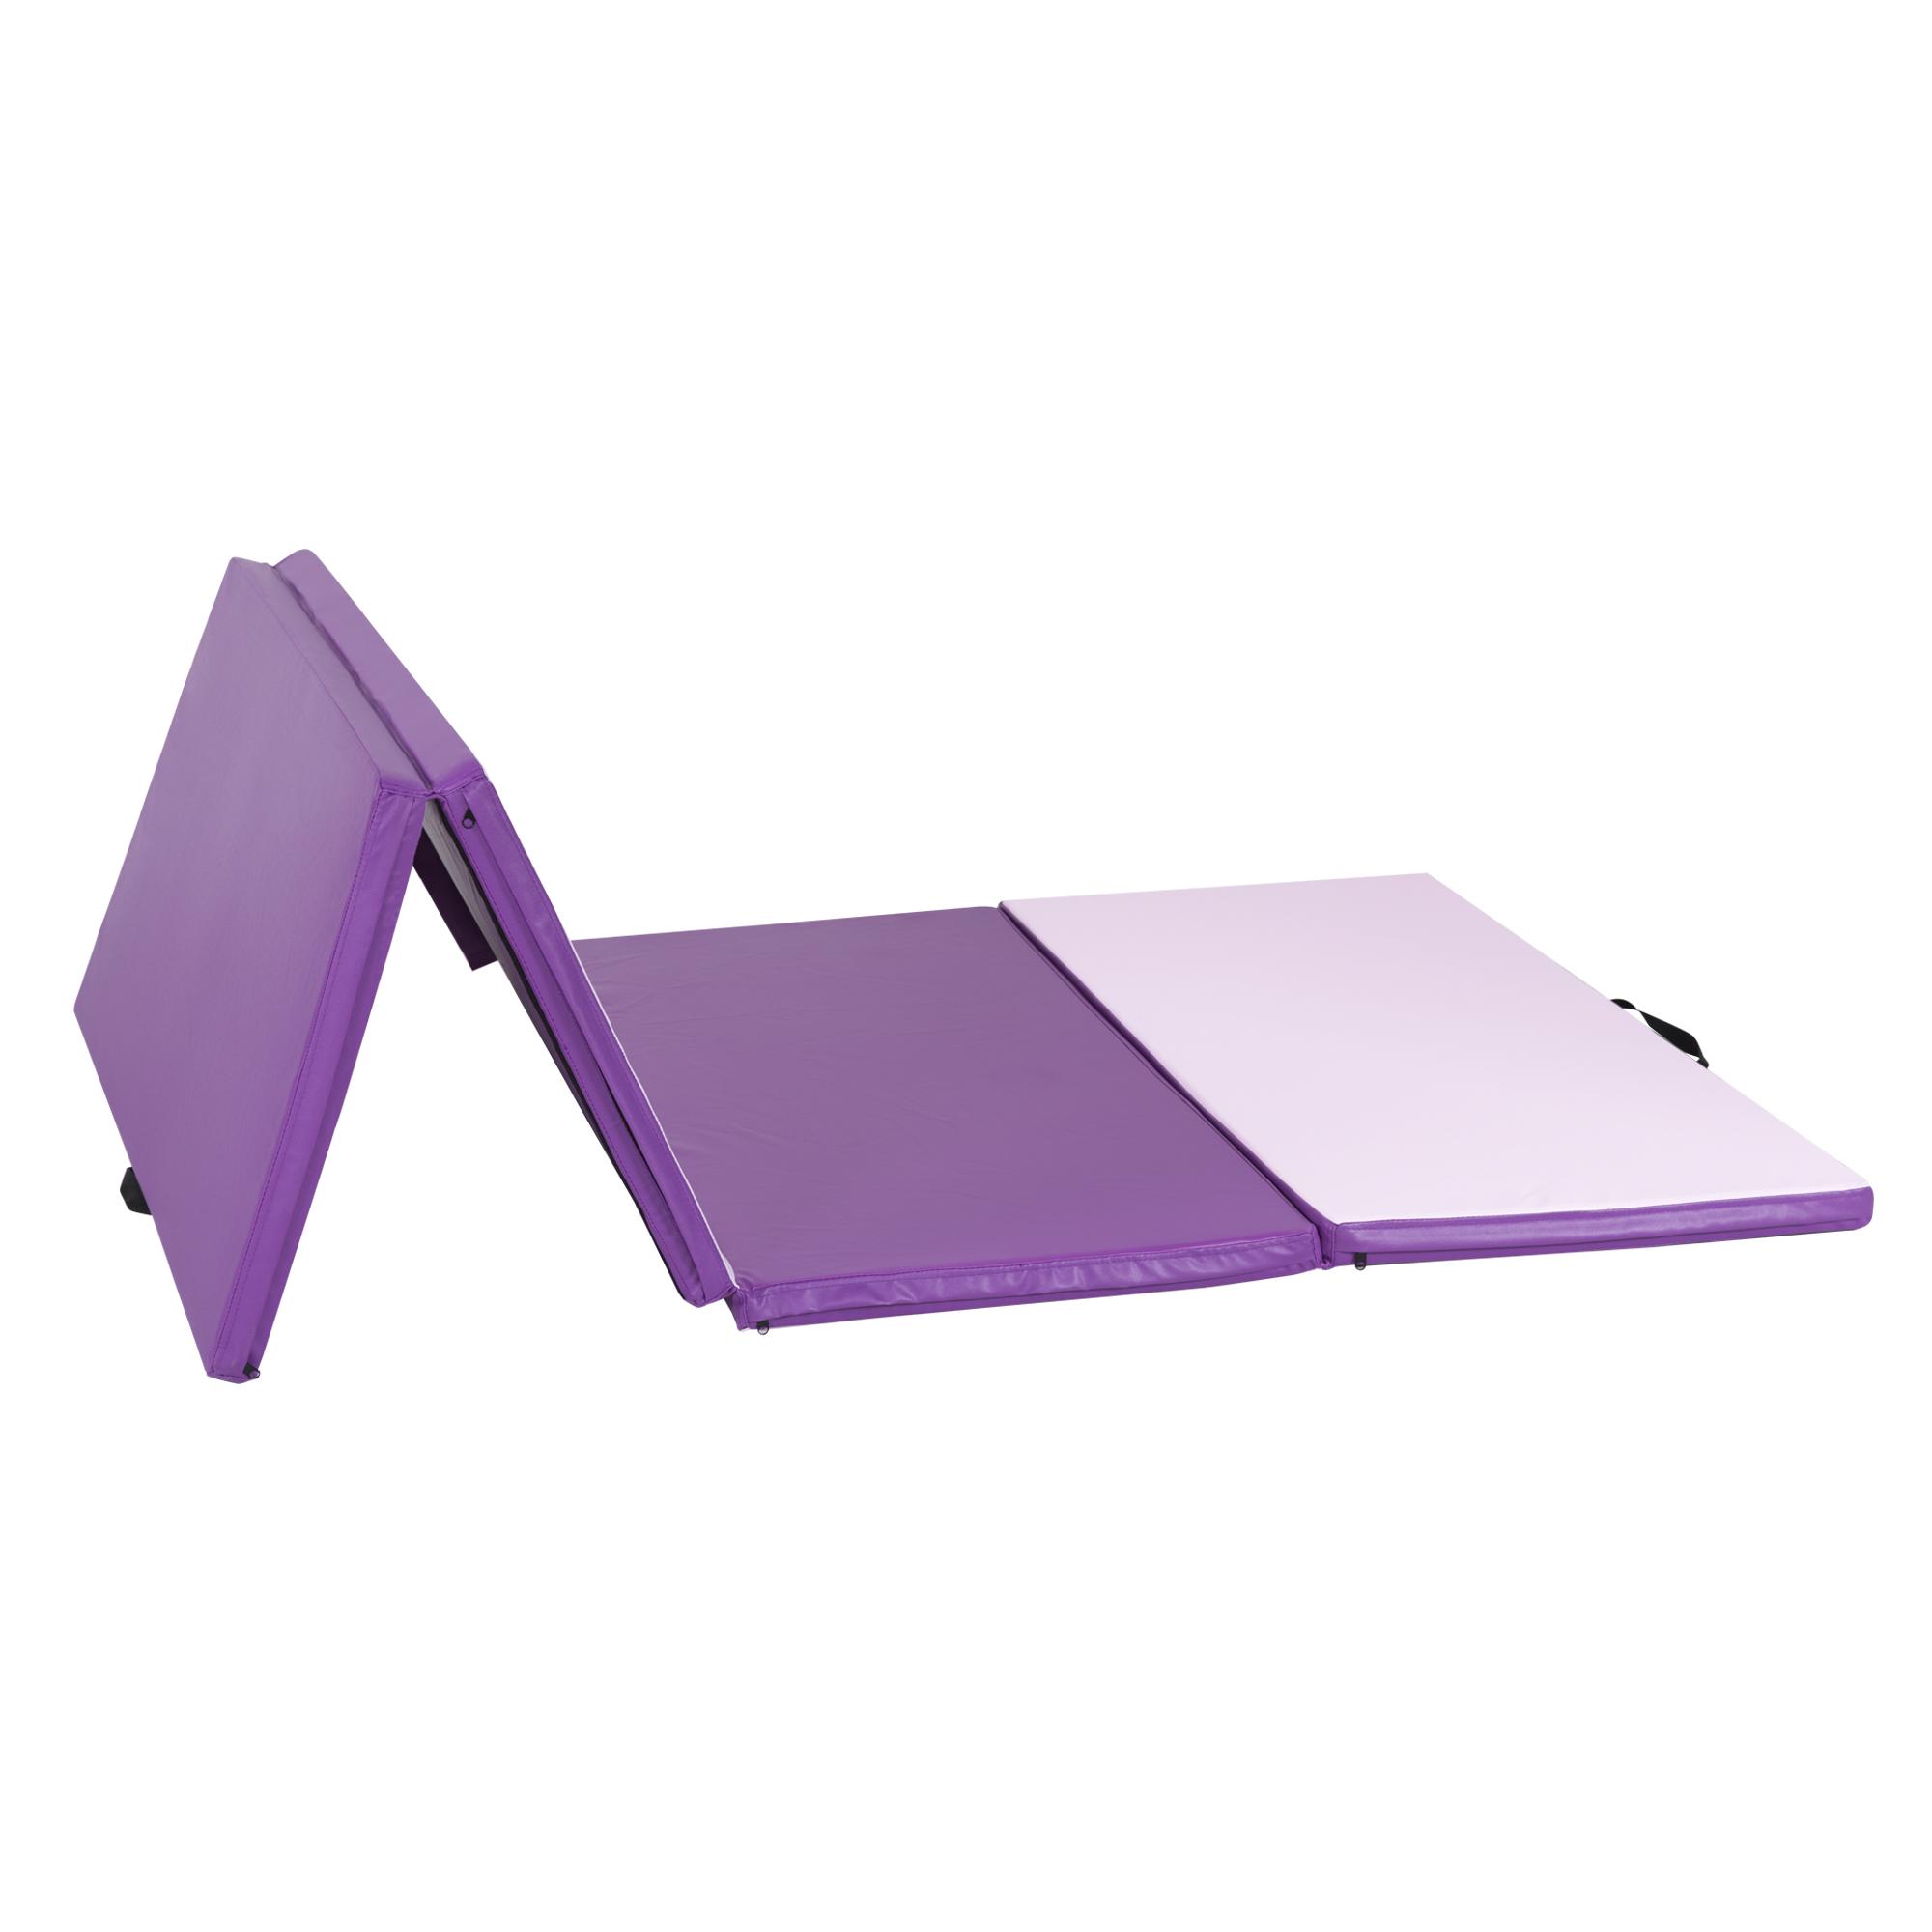 exercise bi products landing gymnastic pad vinyl mat folding product shop fitness bestchoiceproducts mats w best choice rakuten